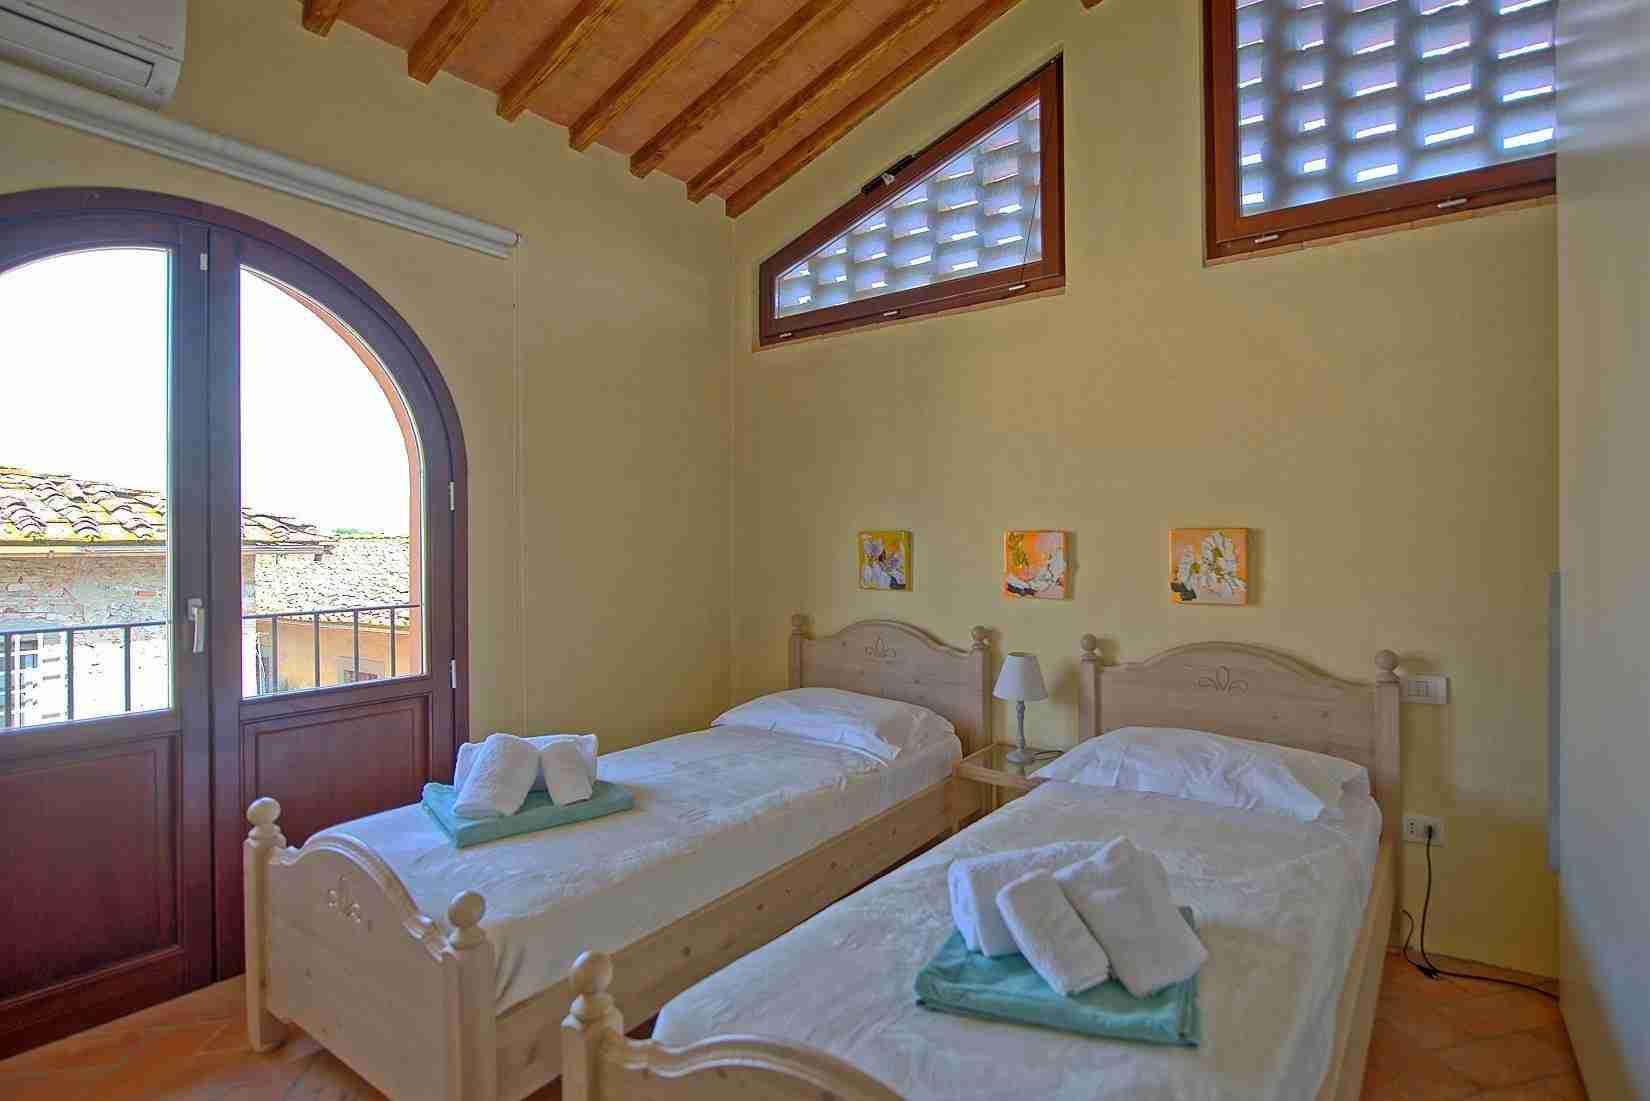 15 Ranieri twin bedroom